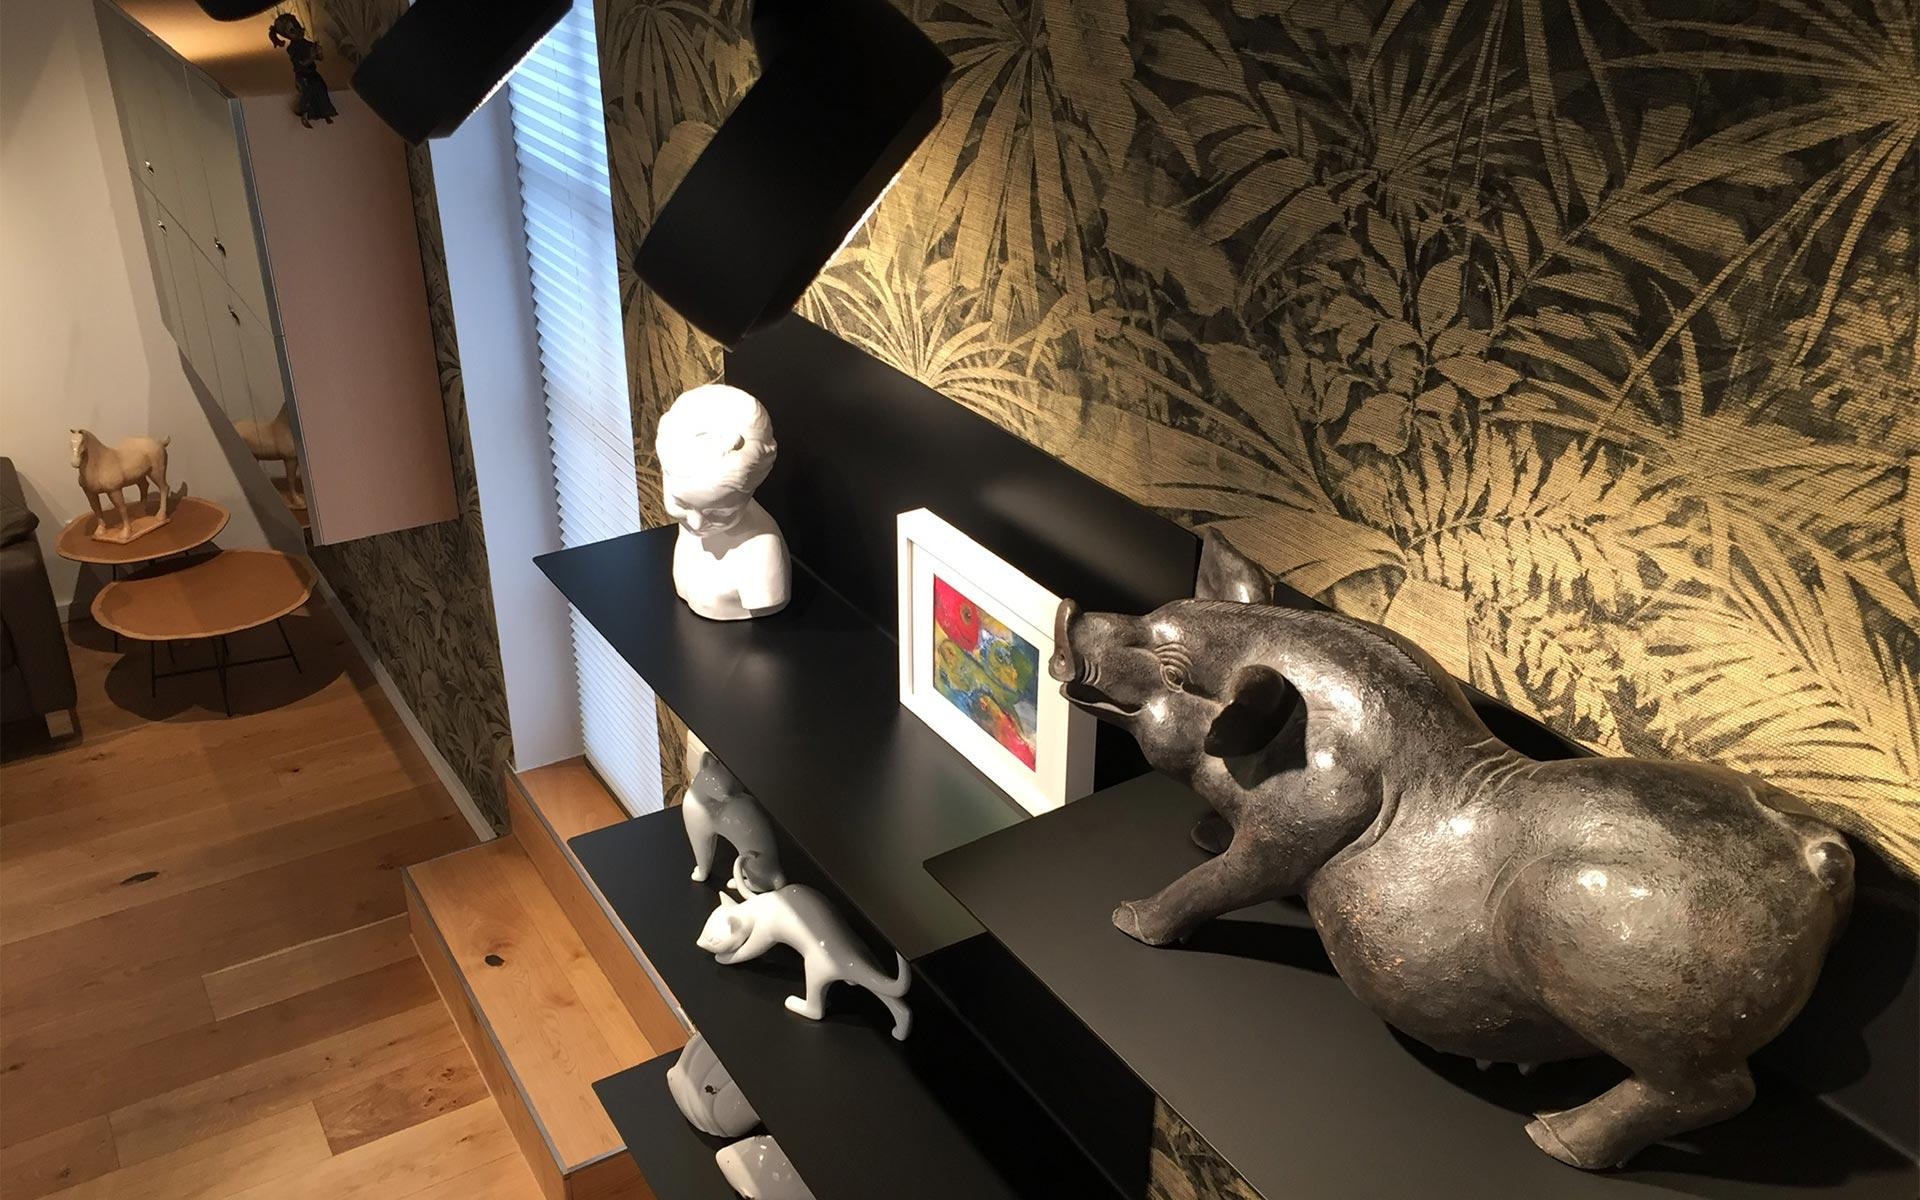 Arte Wandbekleidung + Frost Denmark Regale - Interiordesign steidten+ Berlin